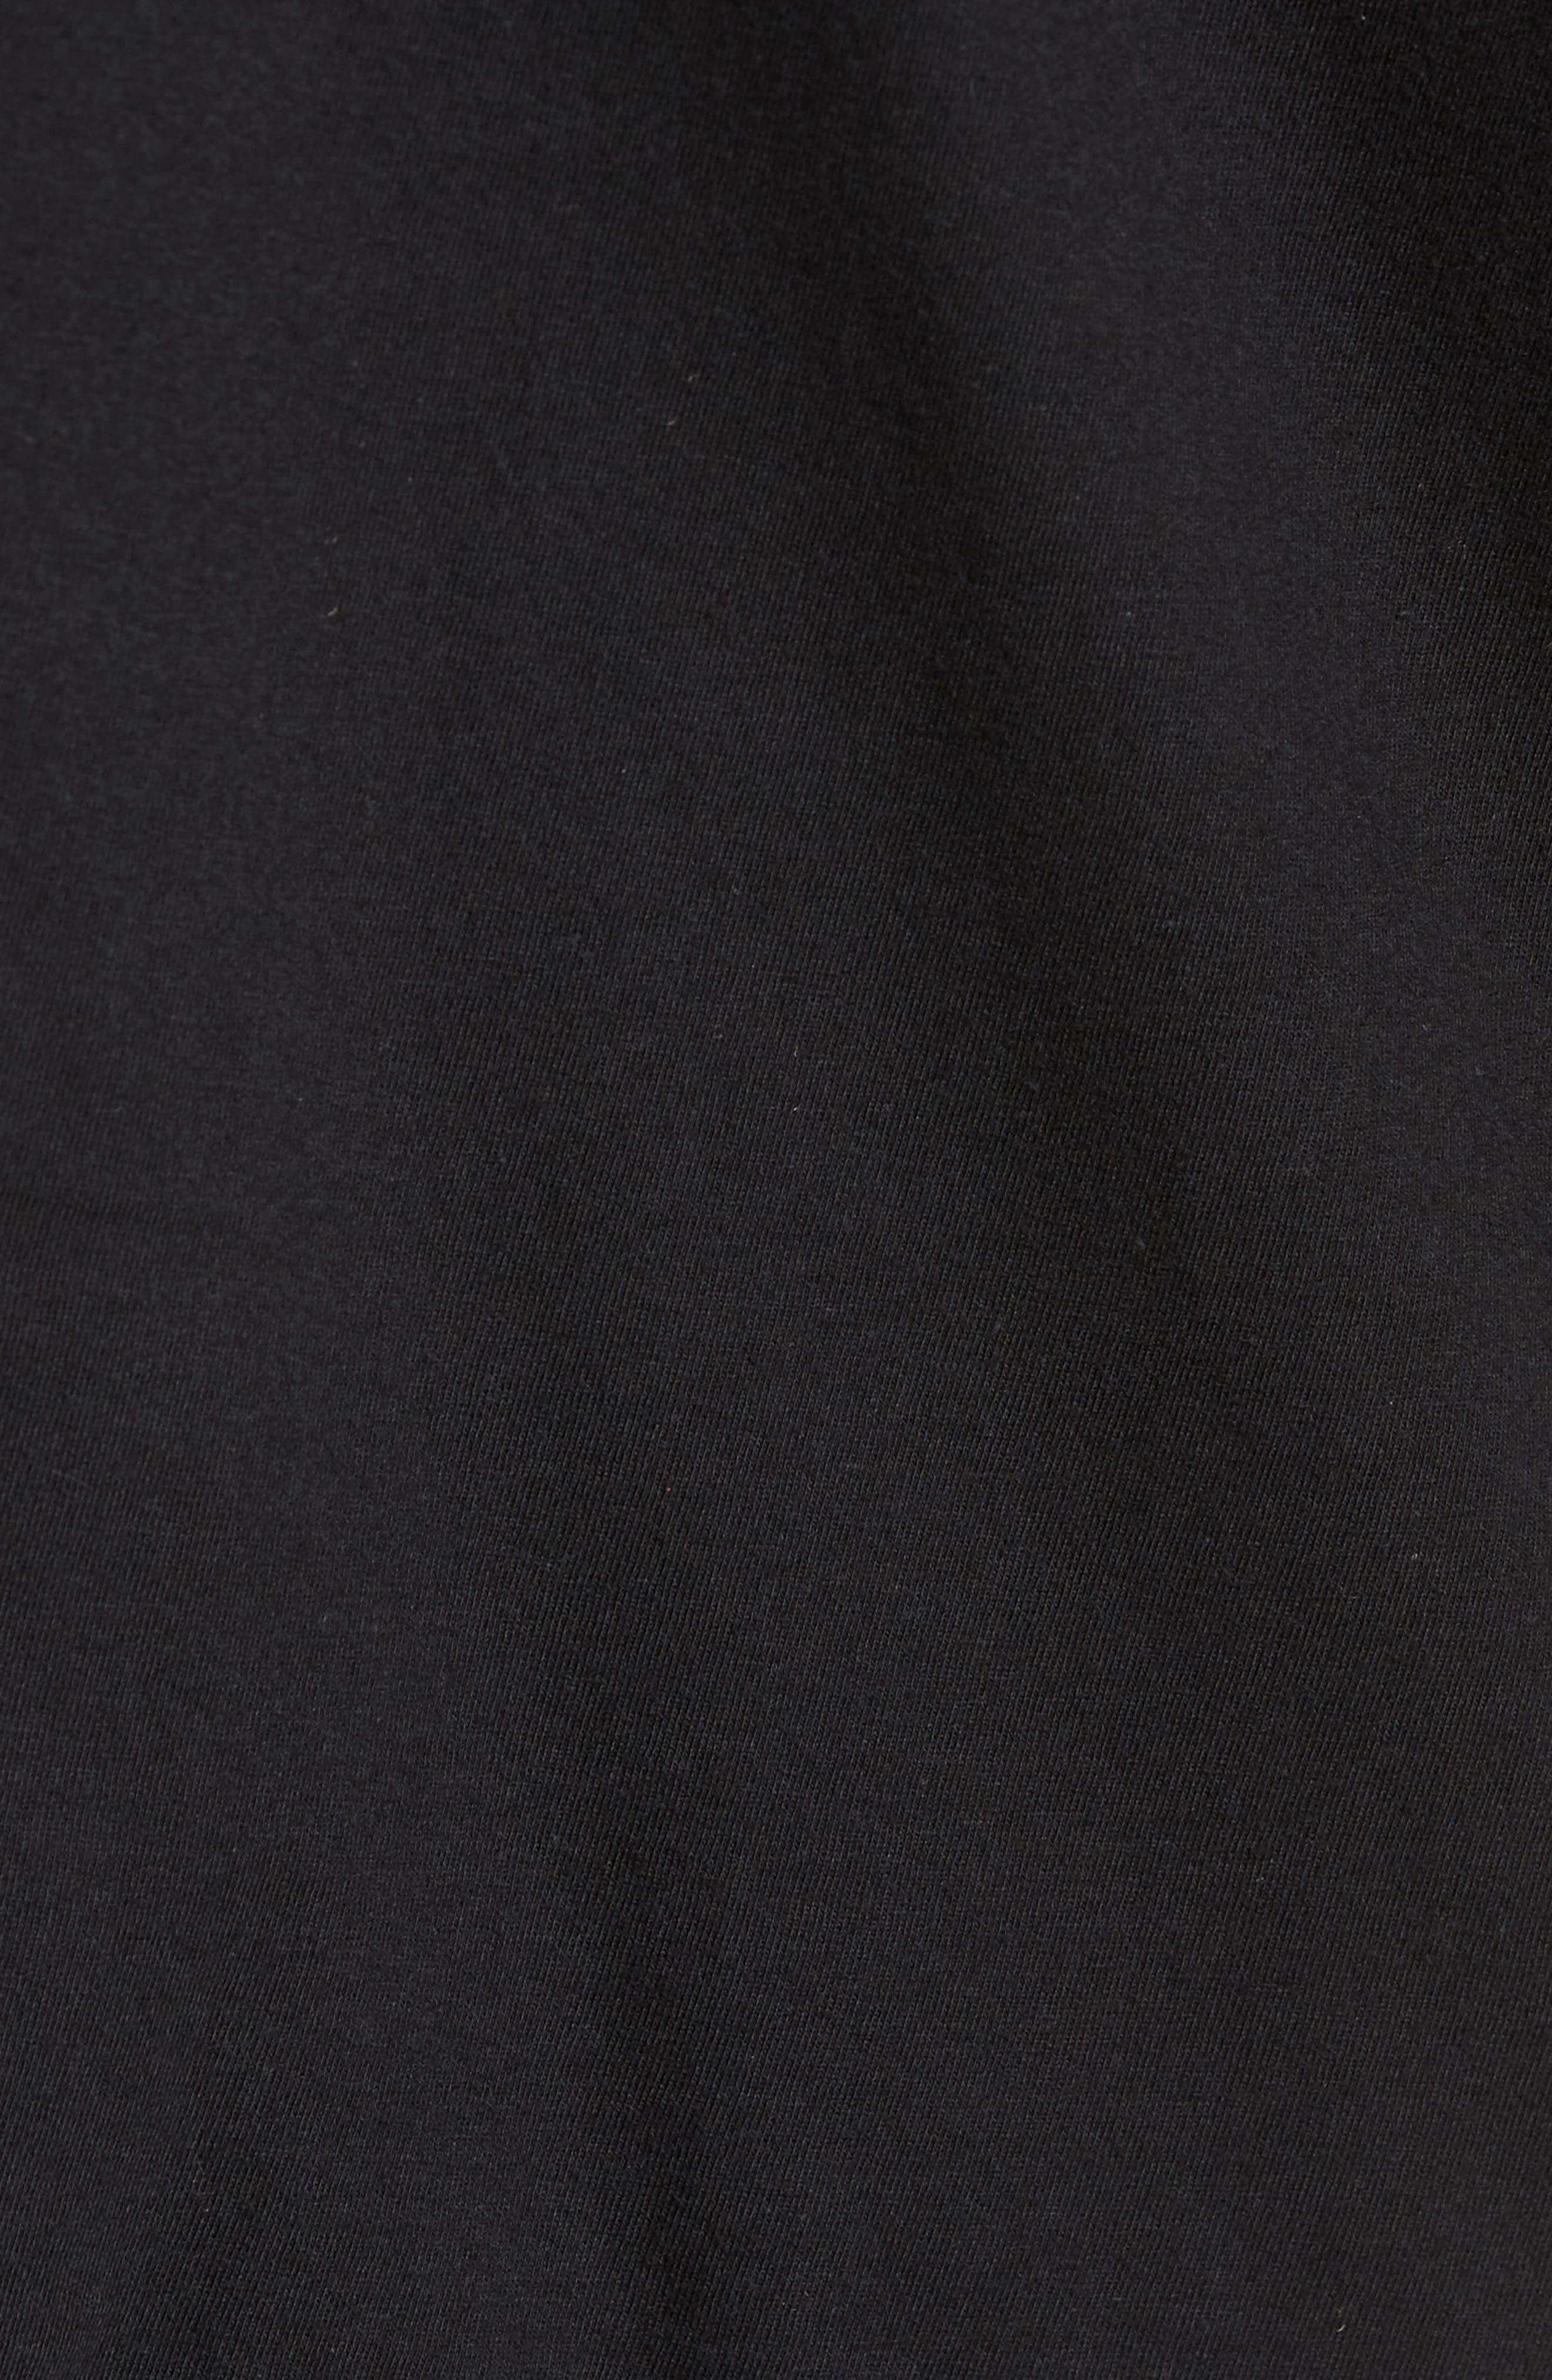 Digital Underground Graphic T-Shirt,                             Alternate thumbnail 5, color,                             Black Lightning D. Underground